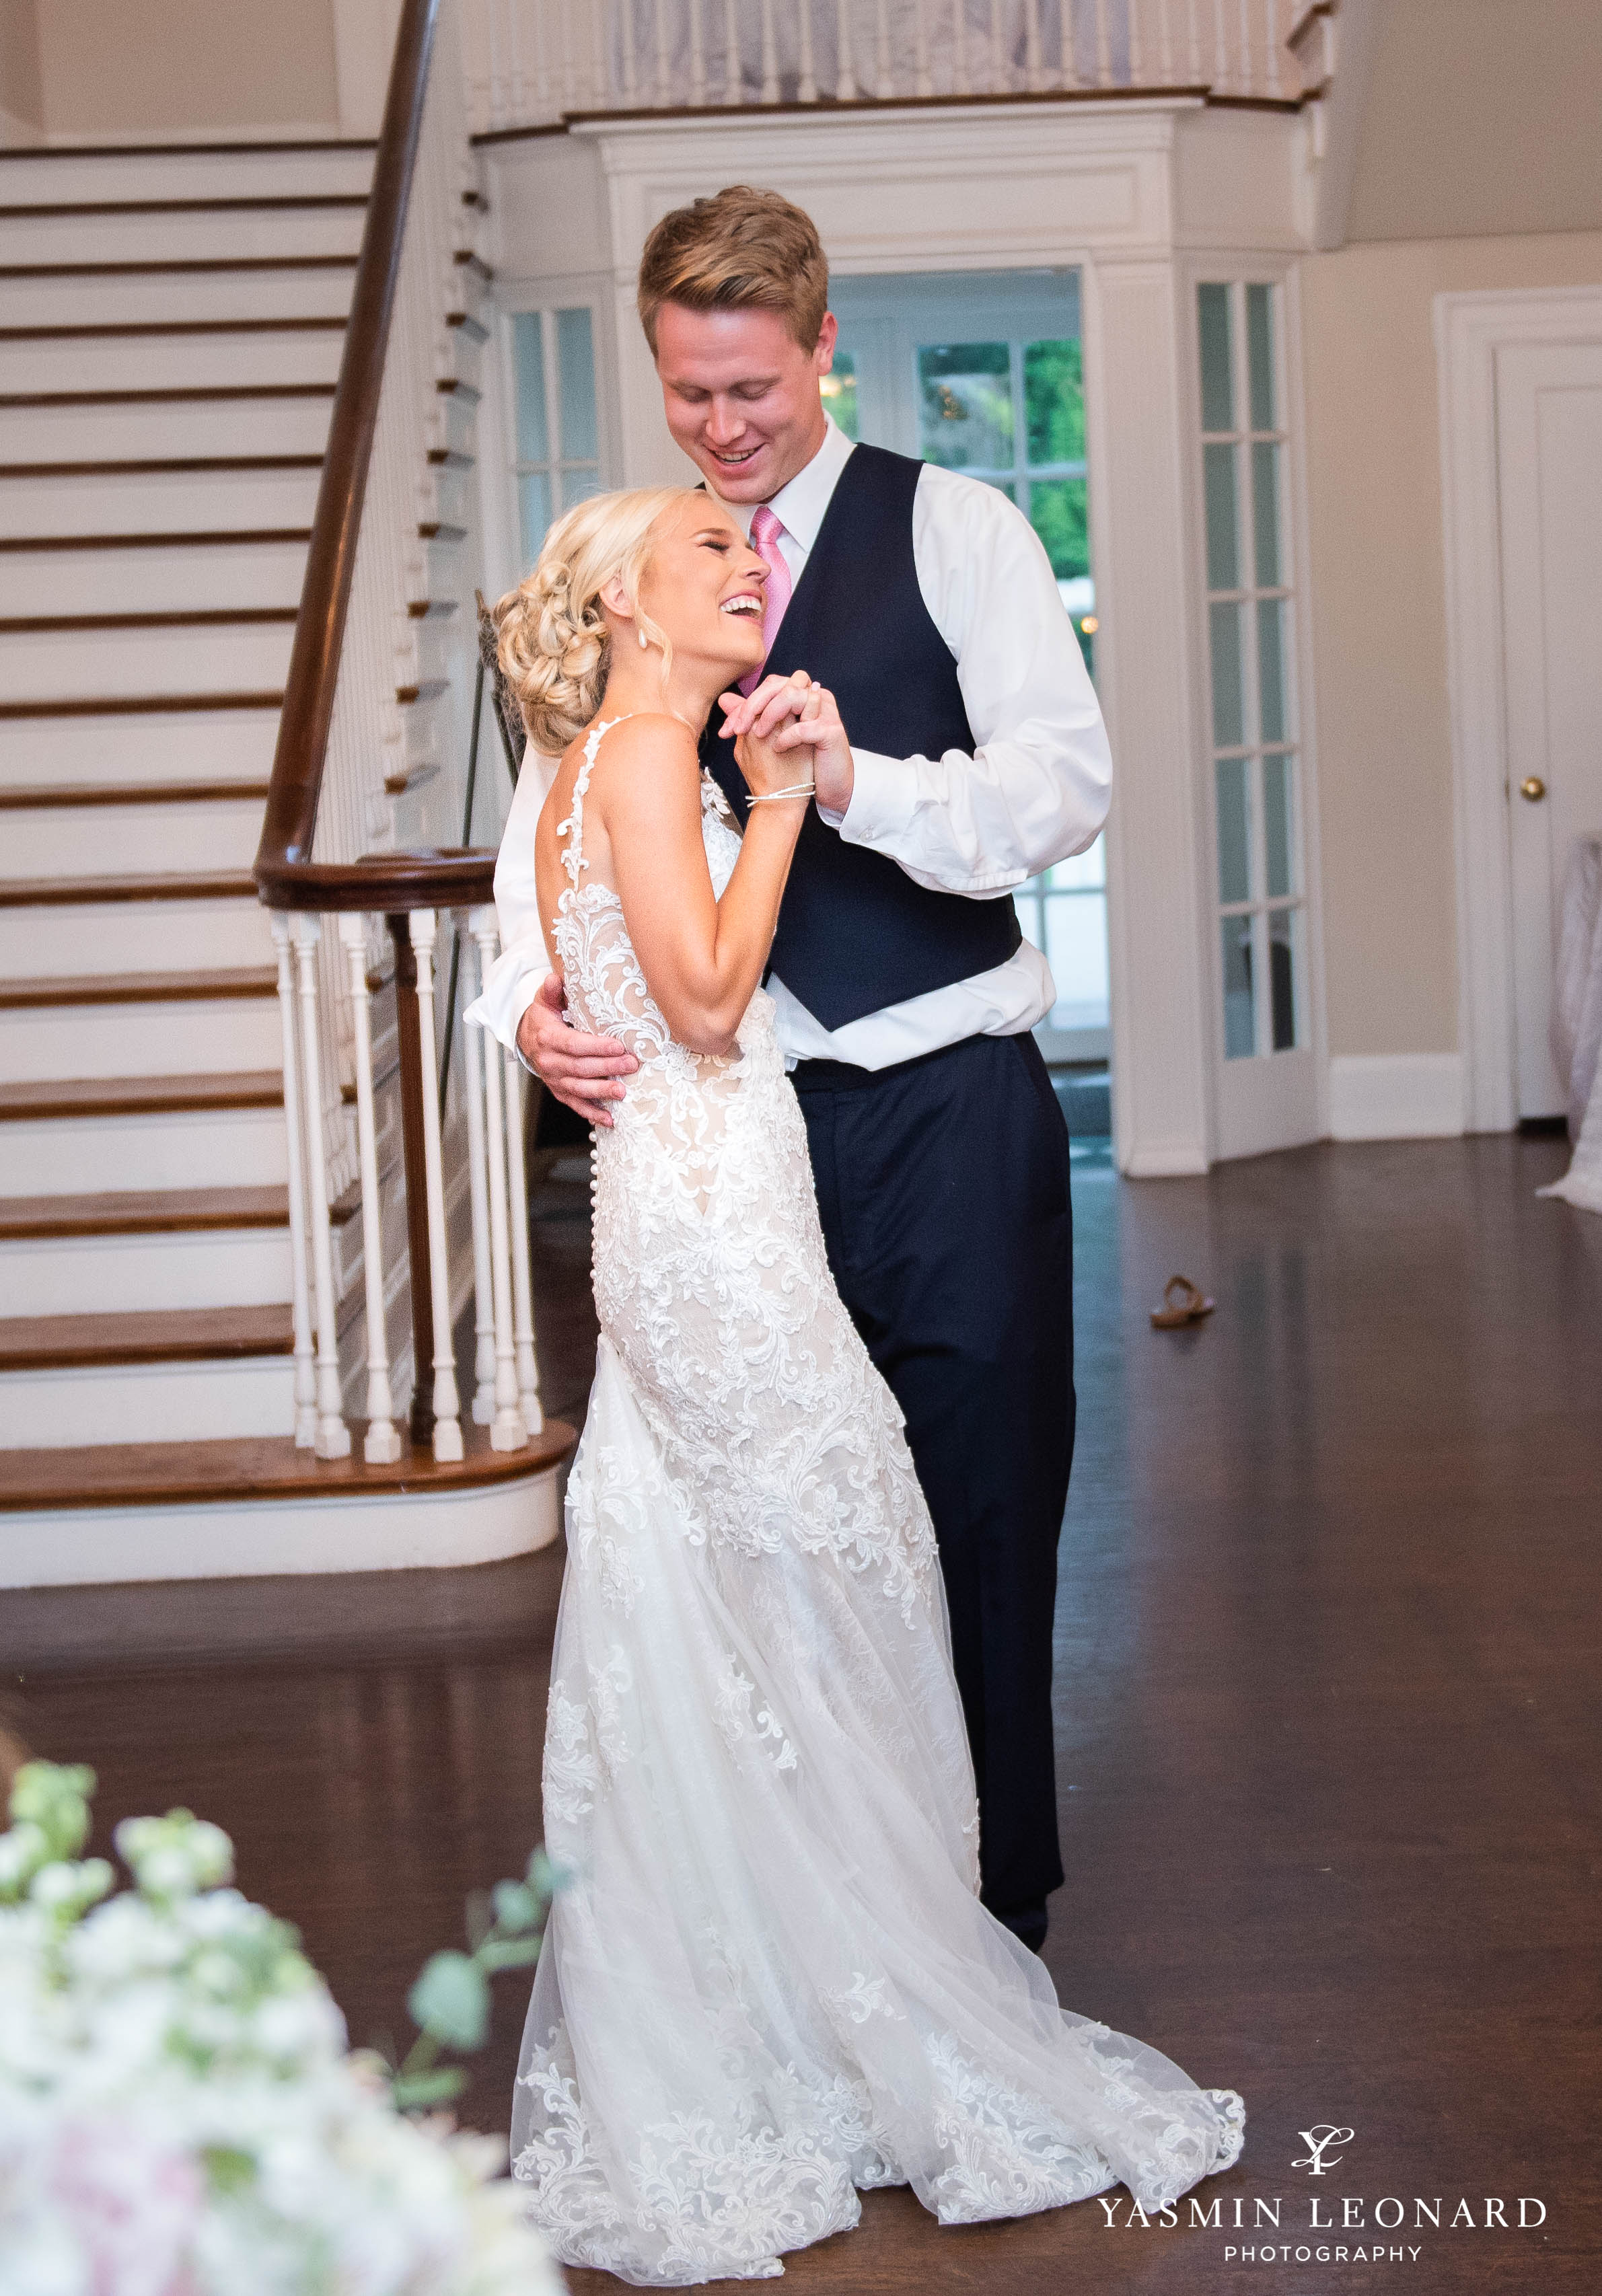 Separk Mansion - NC Weddings - Gastonia Wedding - NC Wedding Venues - Pink and Blue Wedding Ideas - Pink Bridesmaid Dresses - Yasmin Leonard Photography-51.jpg